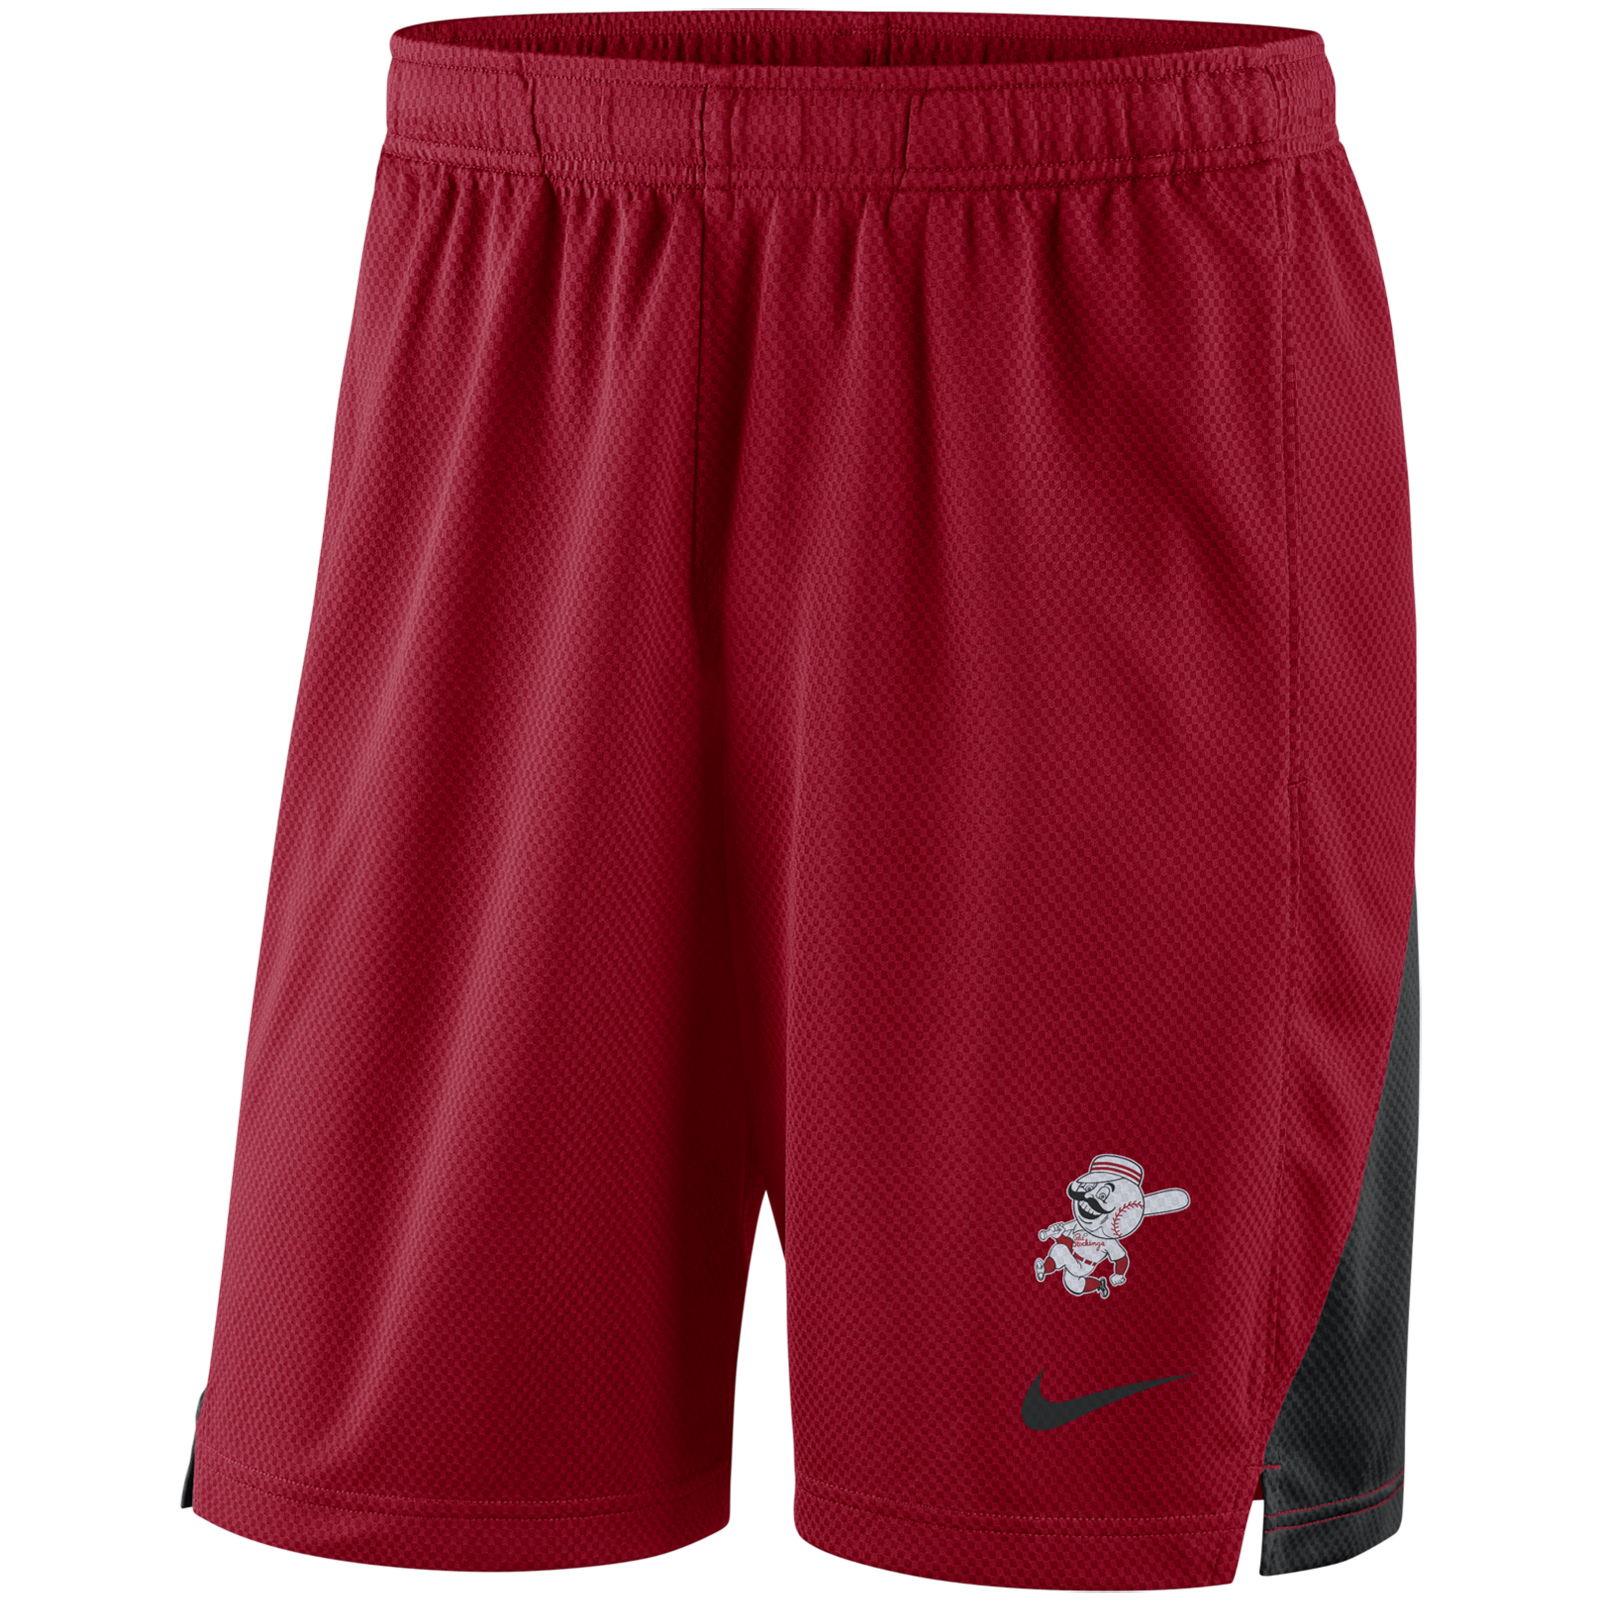 Cincinnati Reds Nike Franchise Performance Shorts - Red